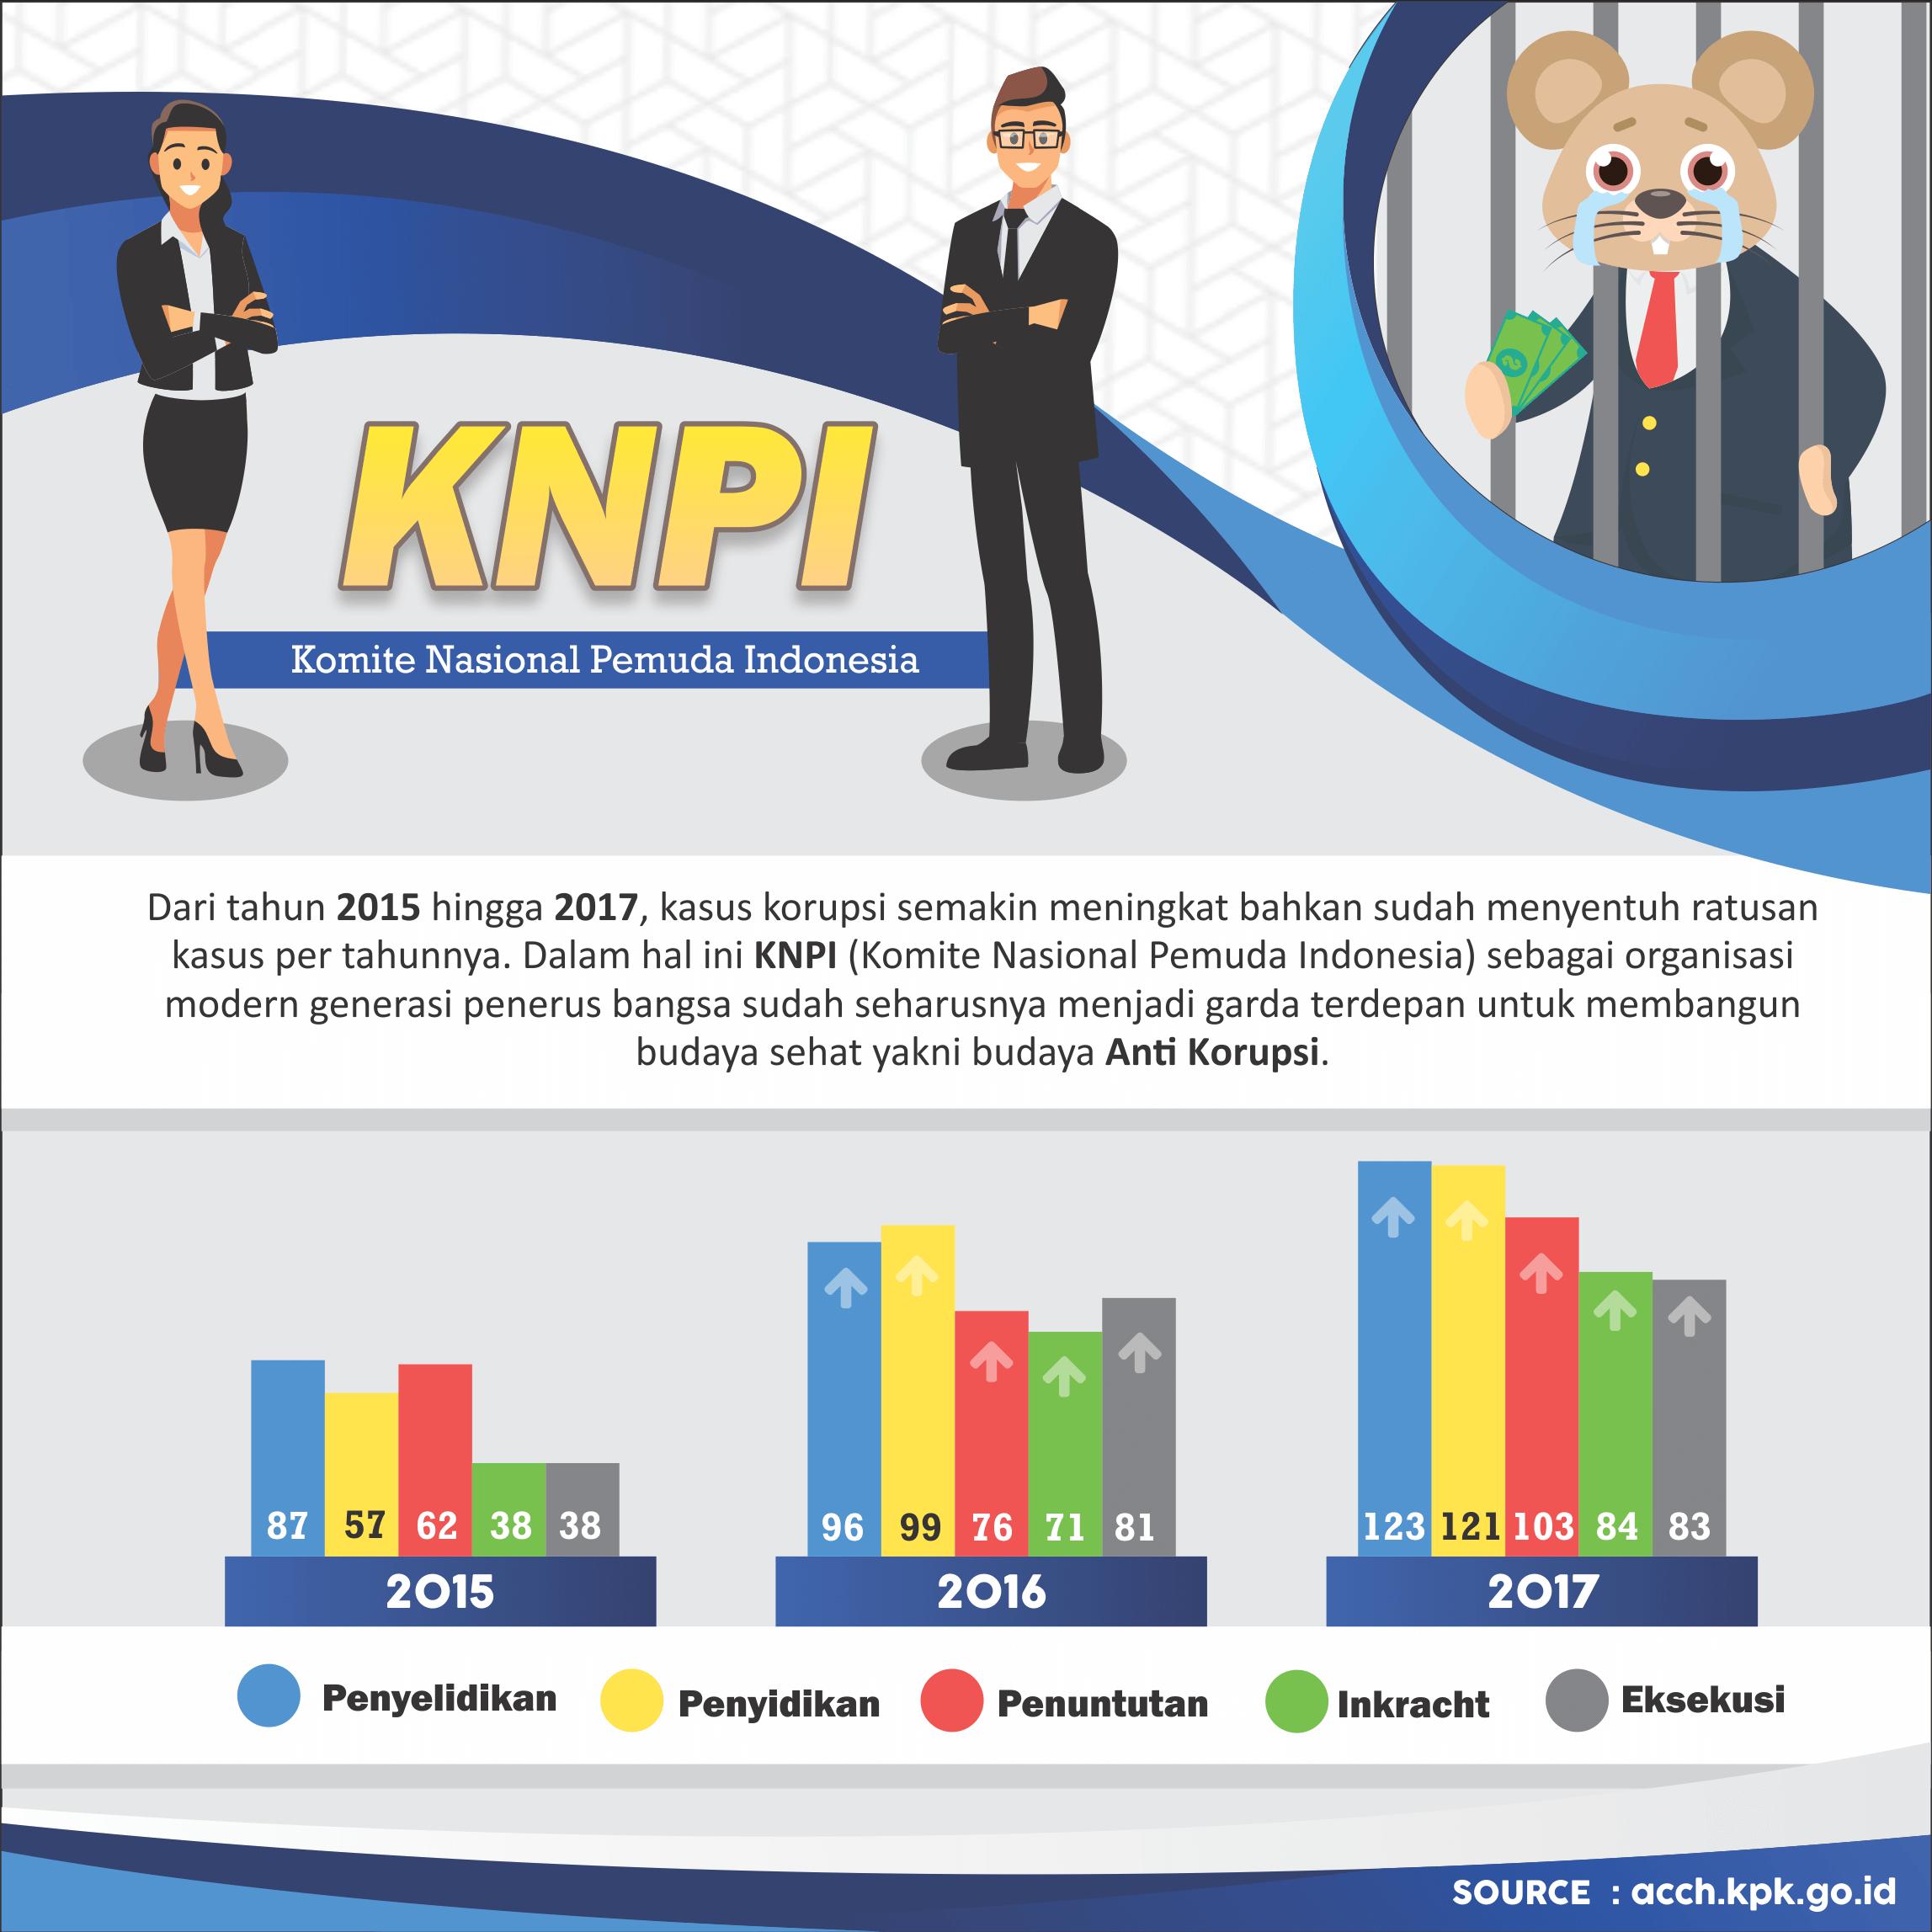 Infografis Komite Nasional Pemuda Indonesia Tokopresentasi